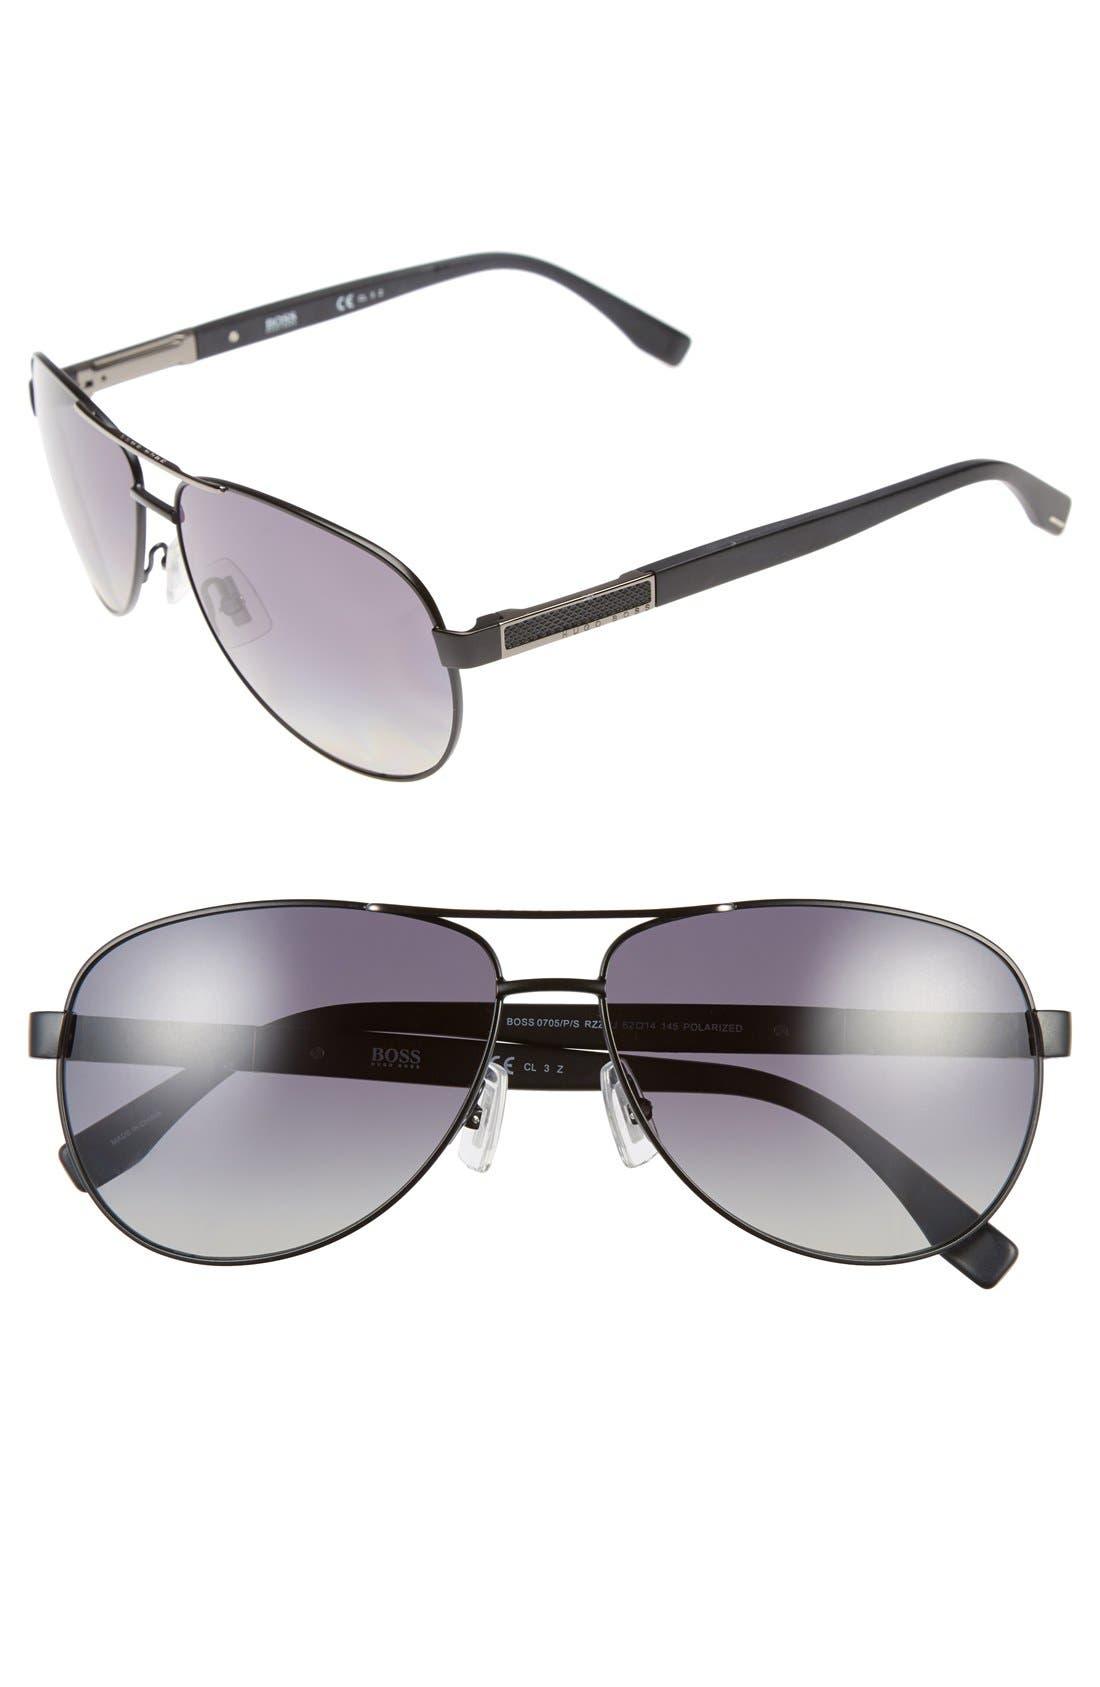 Main Image - BOSS 62mm Polarized Aviator Sunglasses